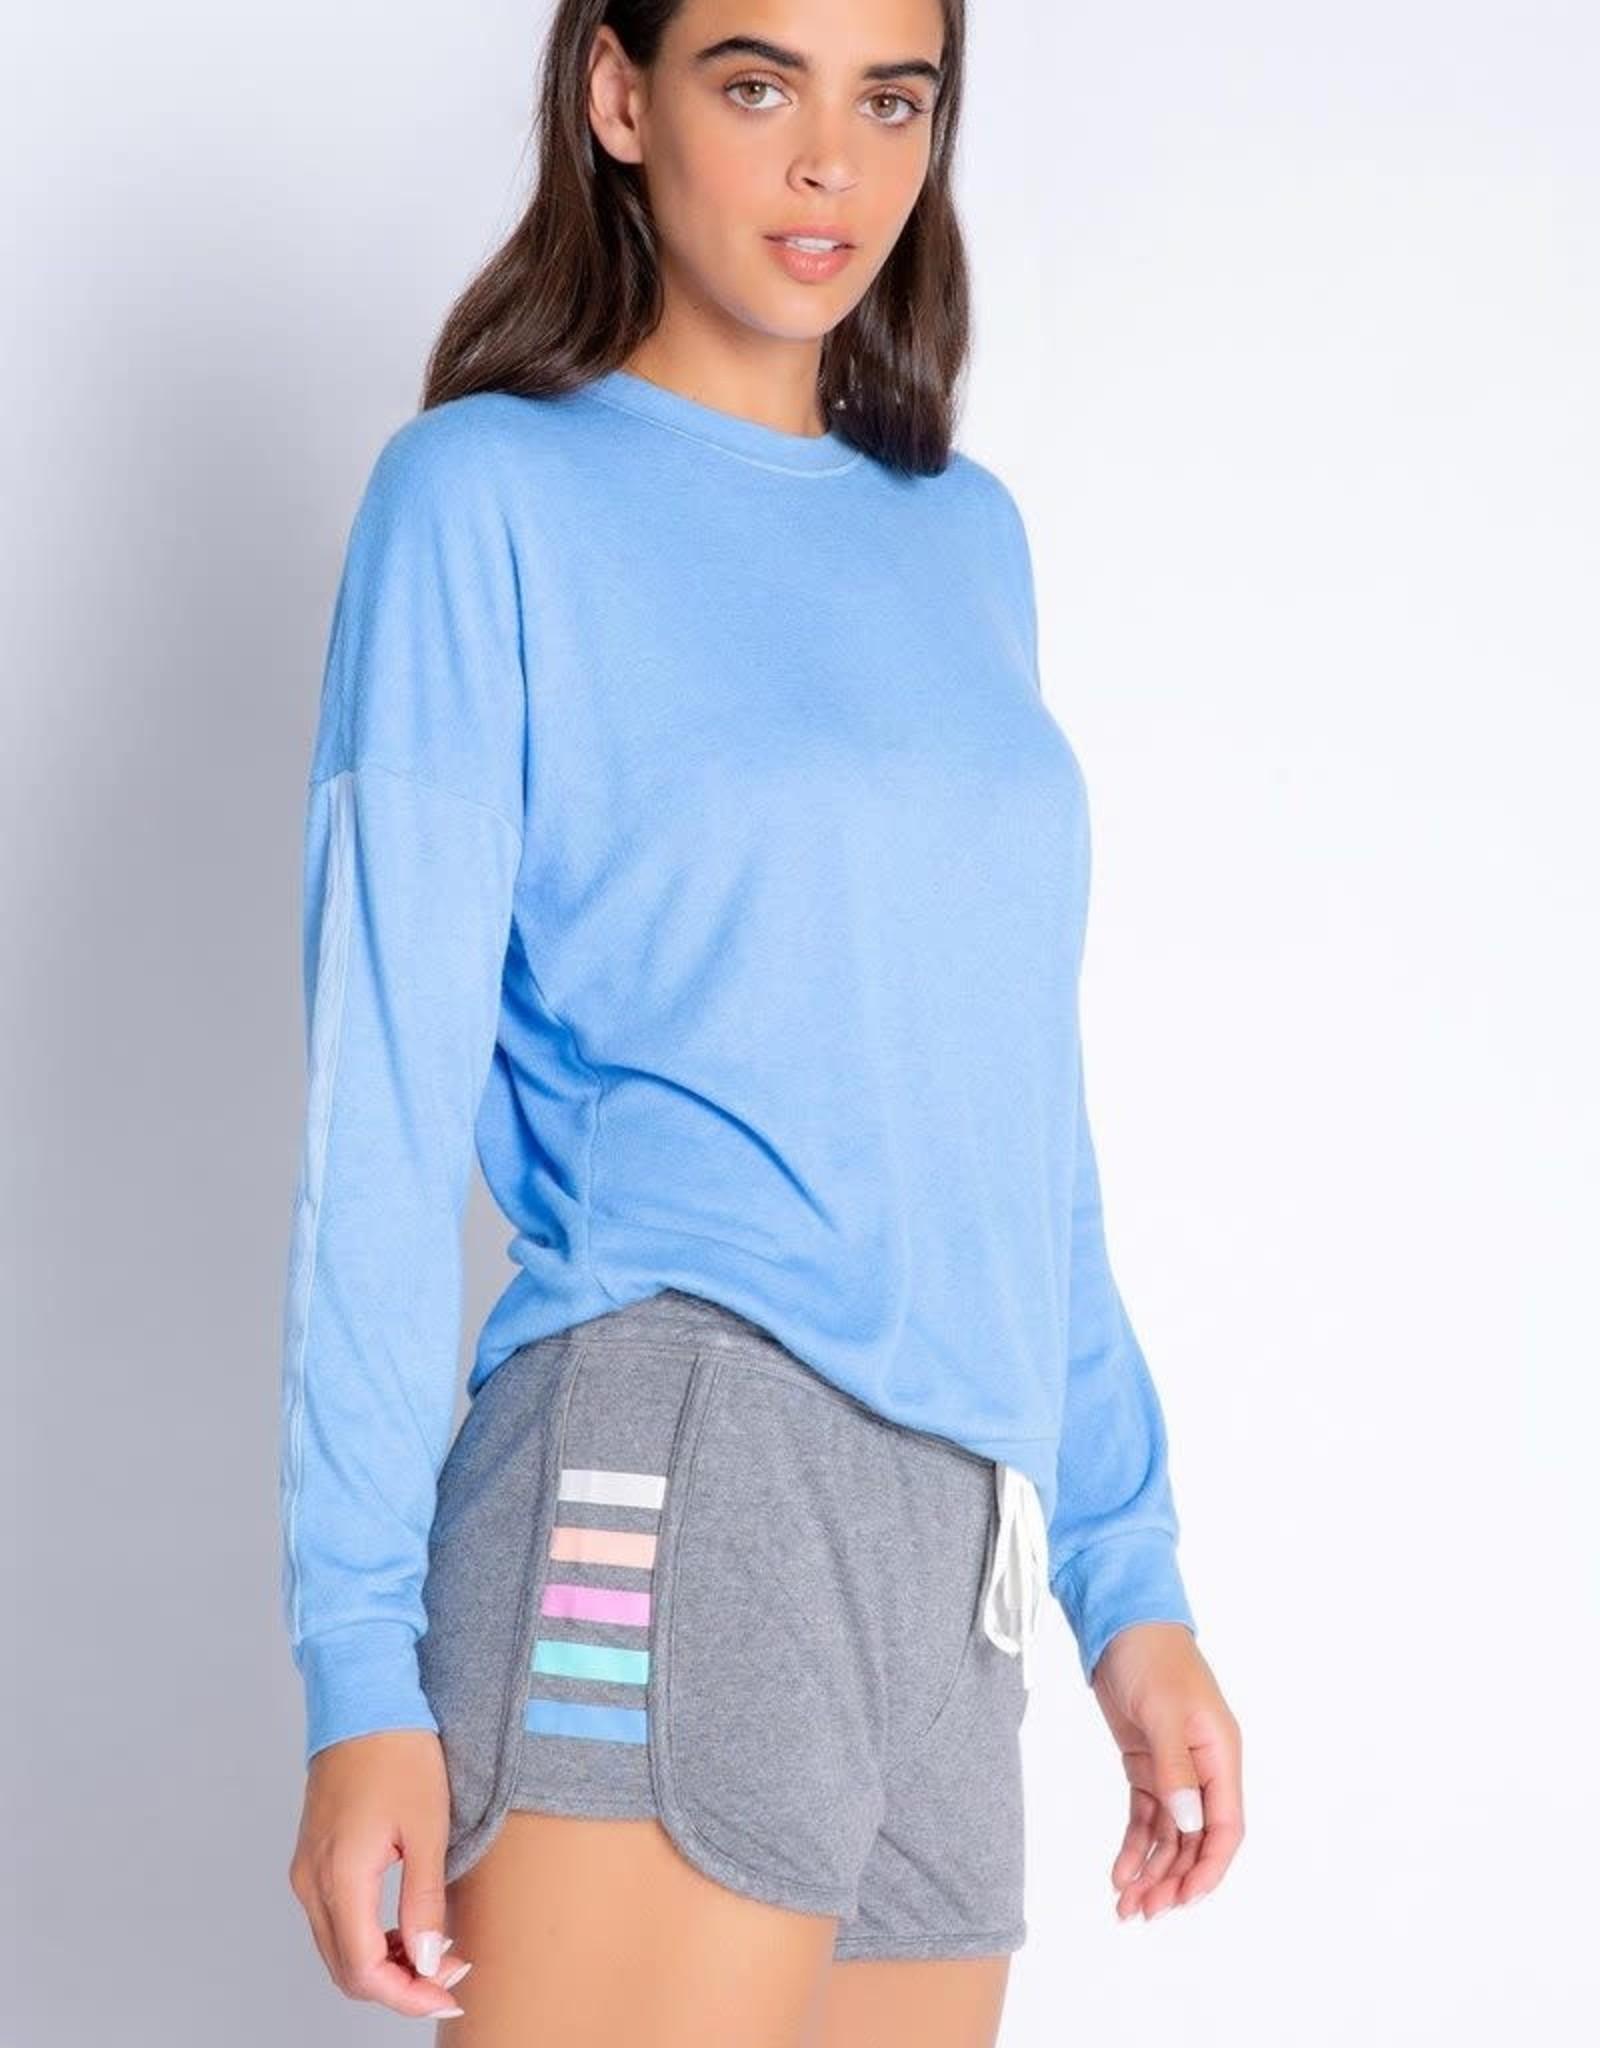 PJ Salvage PJ Salvage Color Classic Gray Shorts